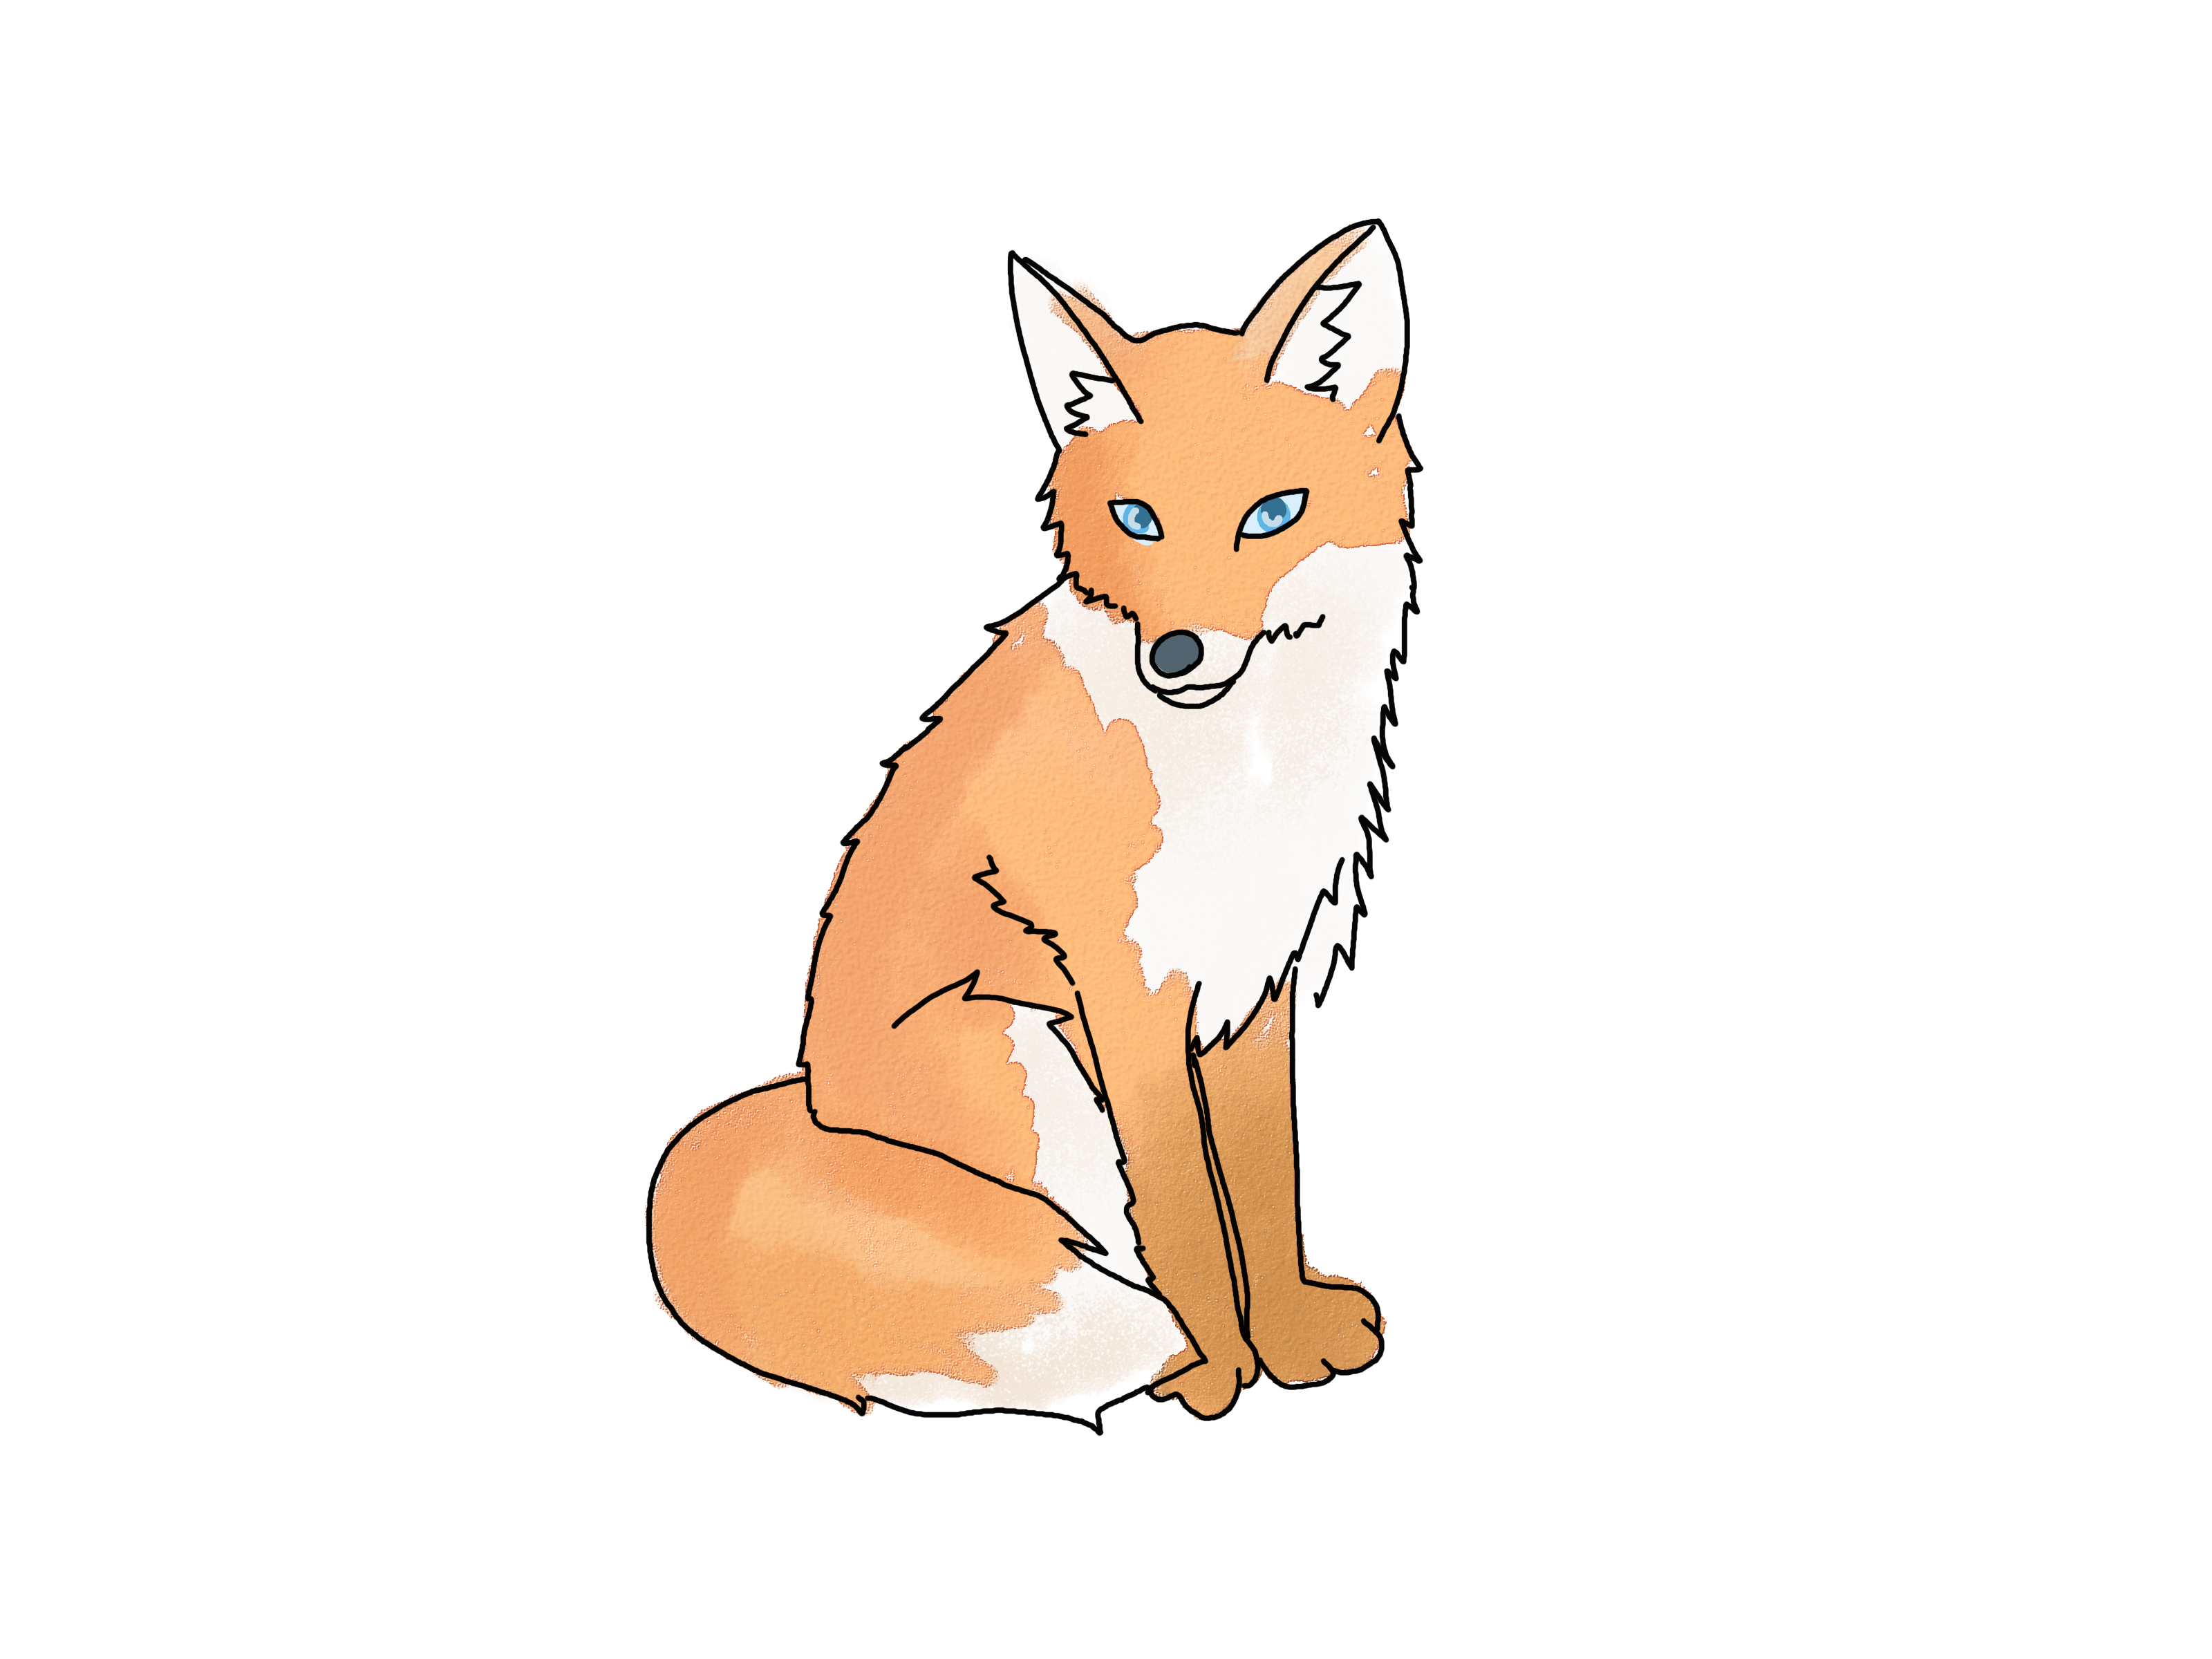 Drawn fox 312 Find best more on